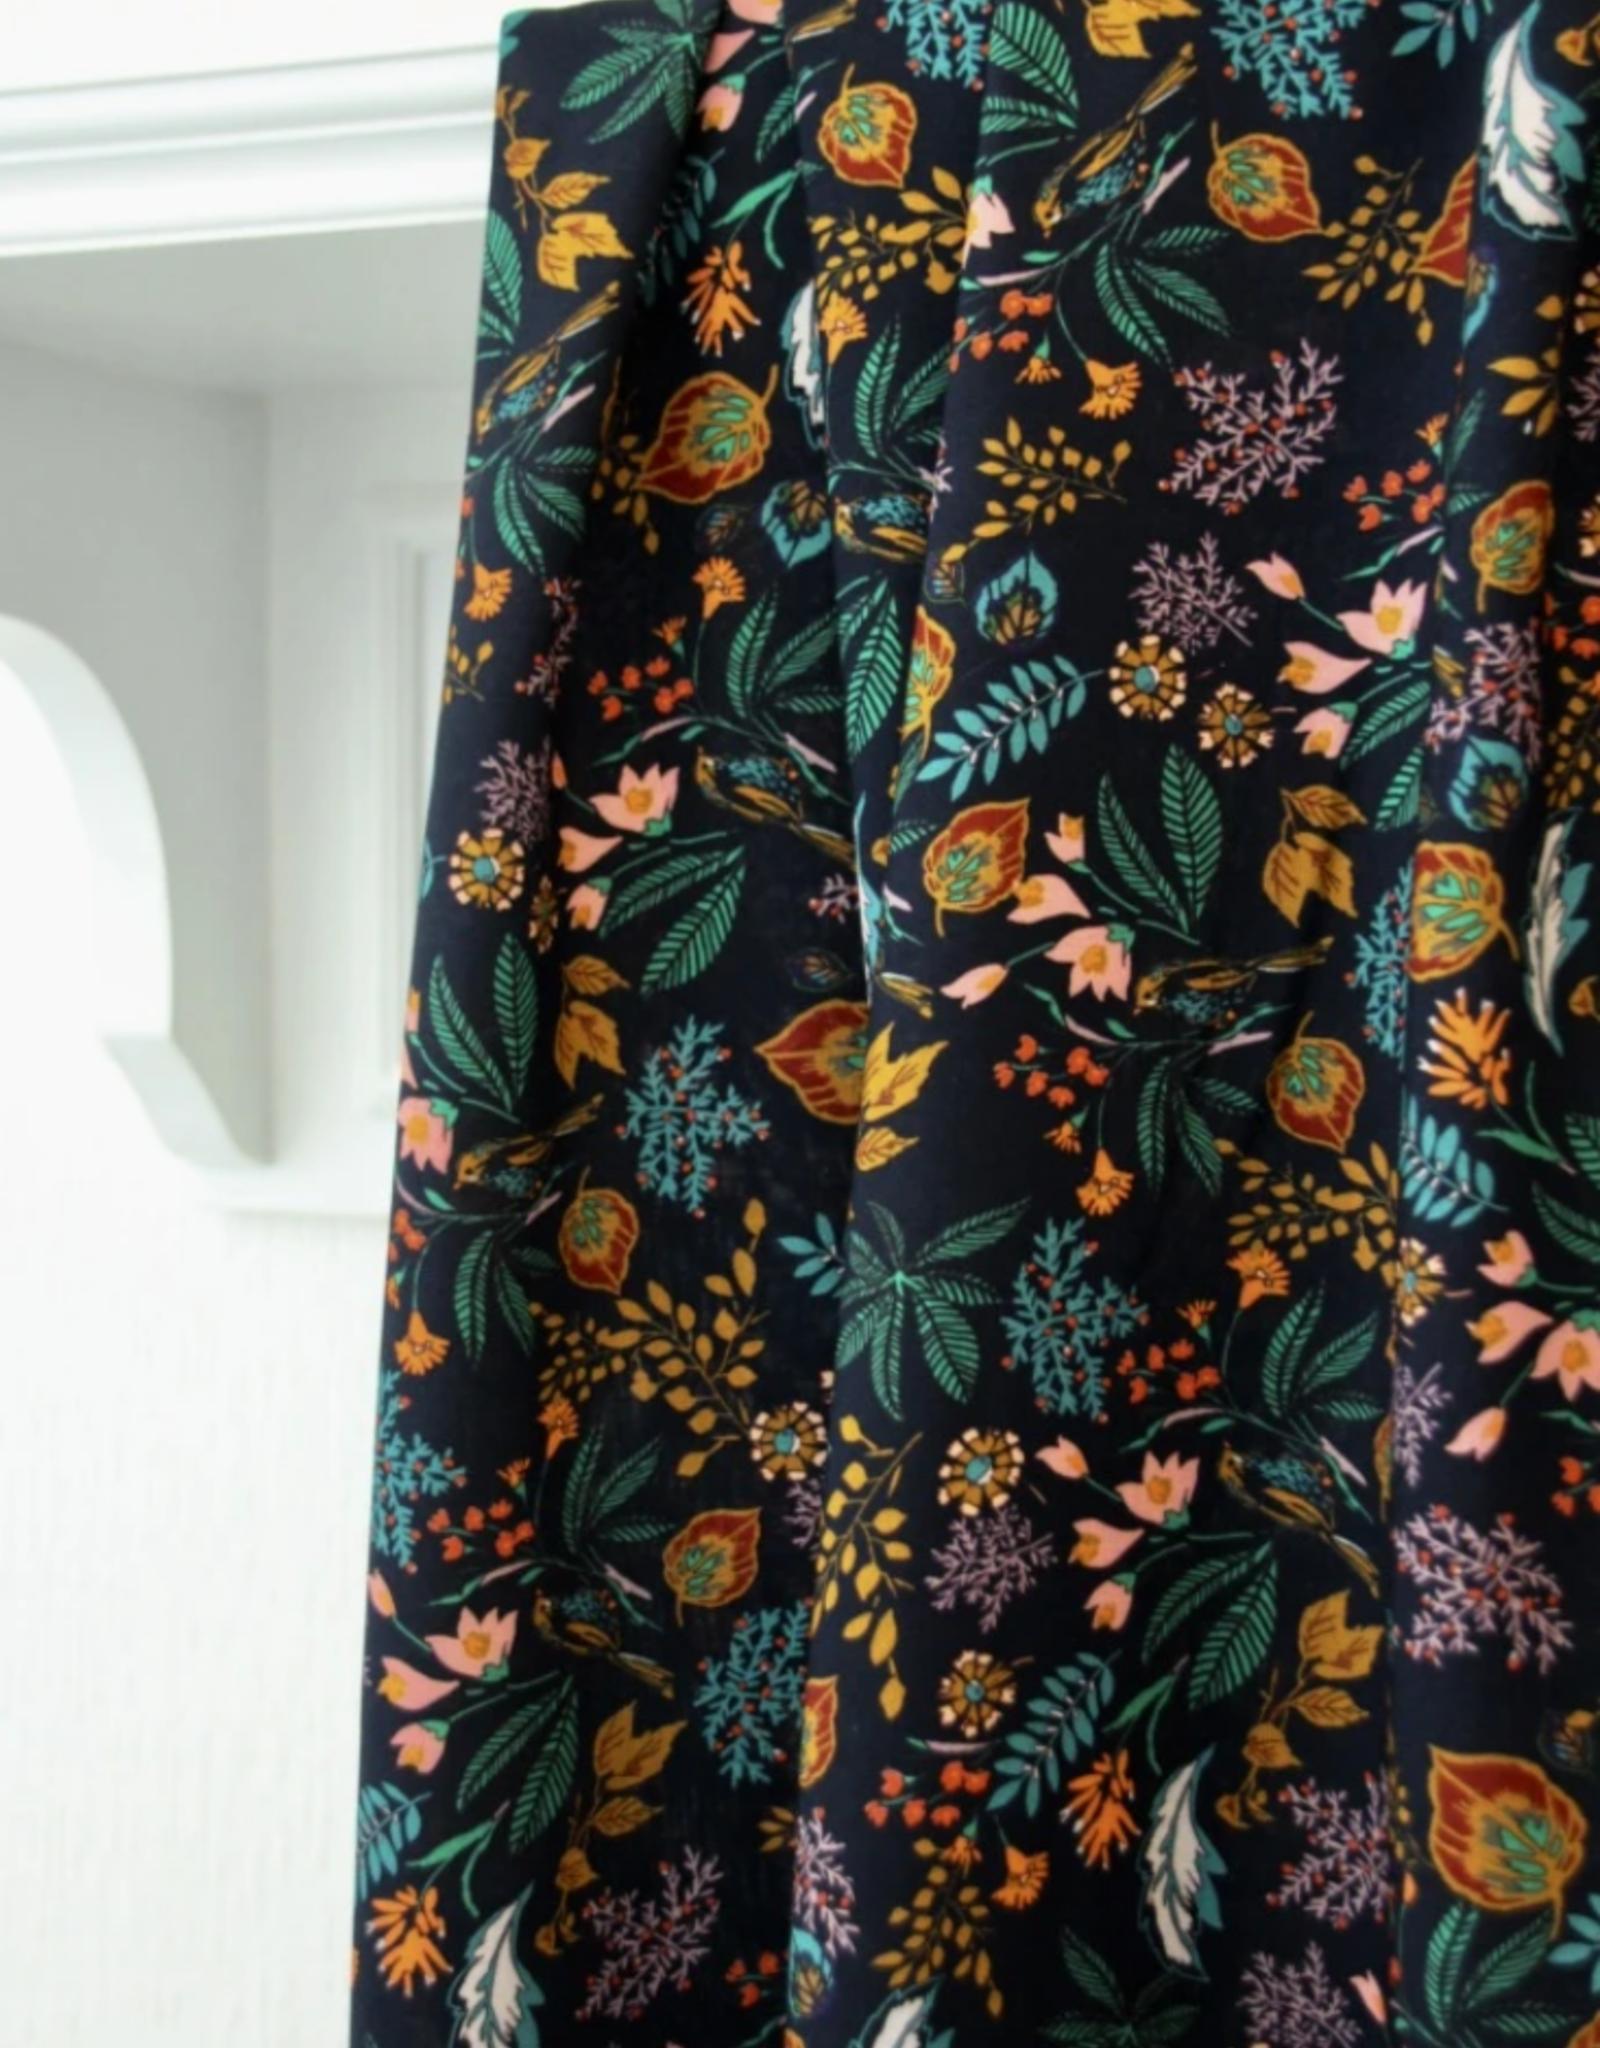 Atelier Jupe Atelier jupe - Donkerblauwe viscose met kleurrijke print